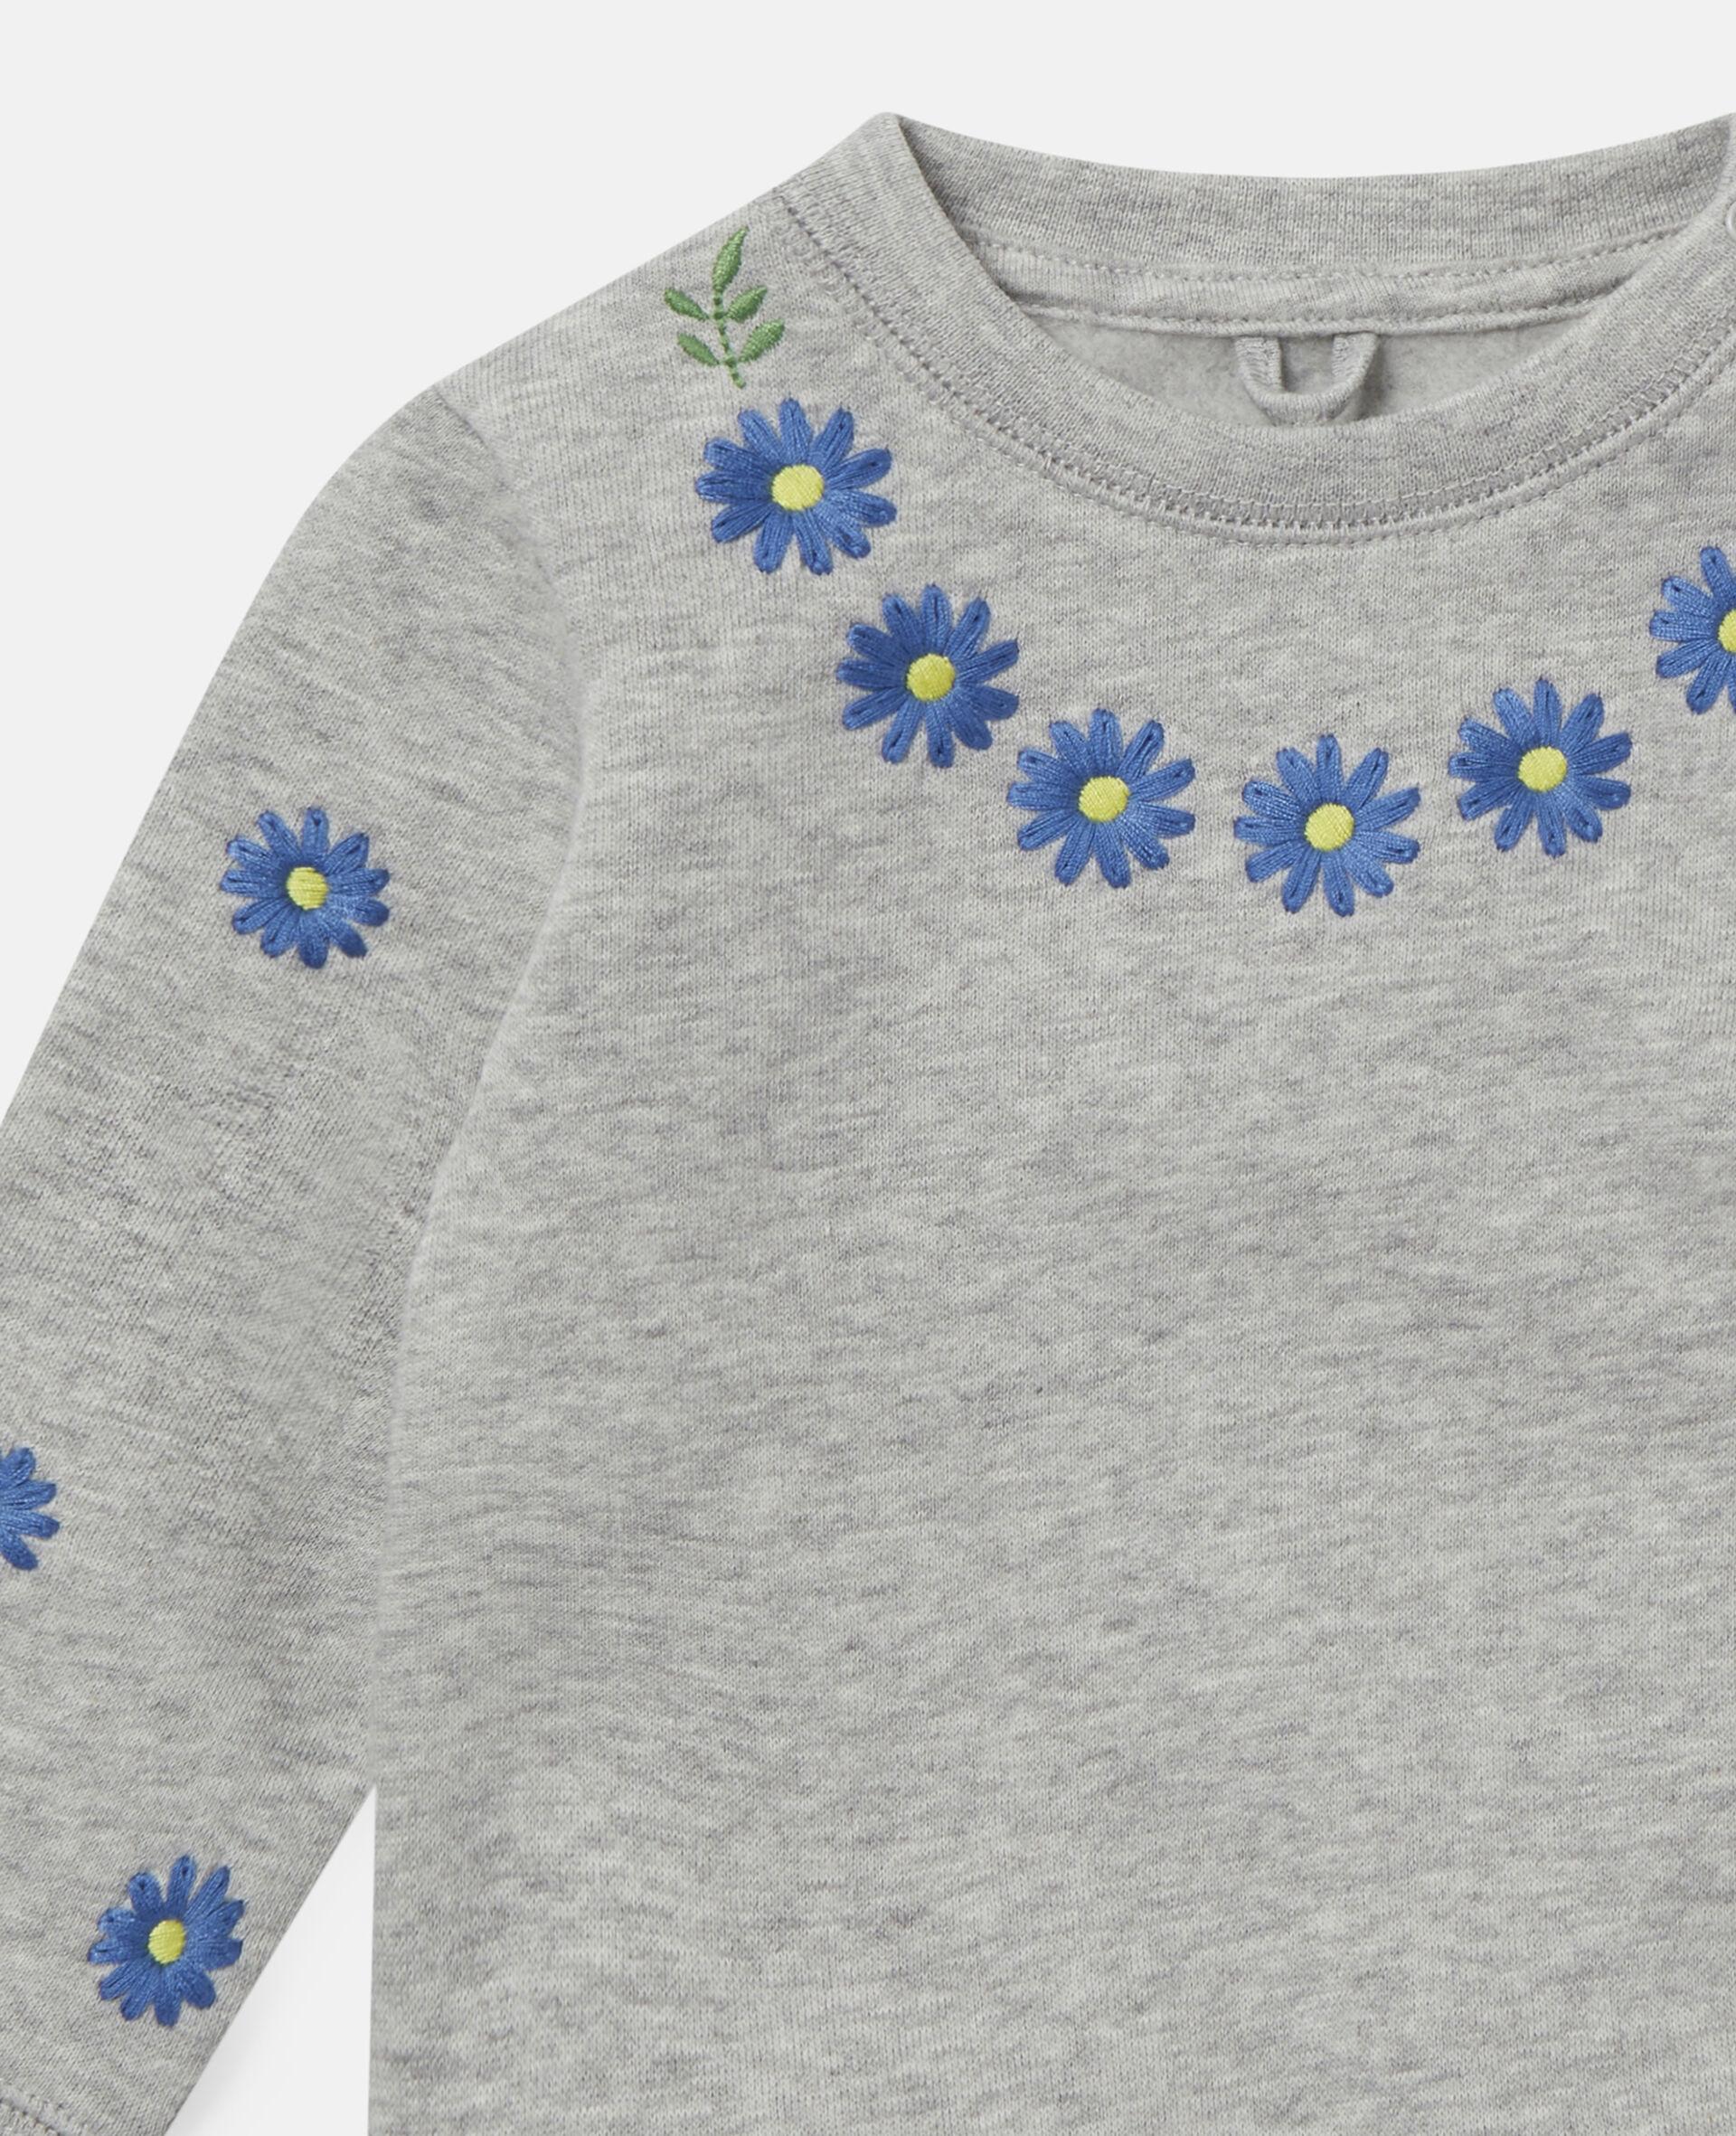 Embroidered Daisies Fleece Sweatshirt -Grey-large image number 1